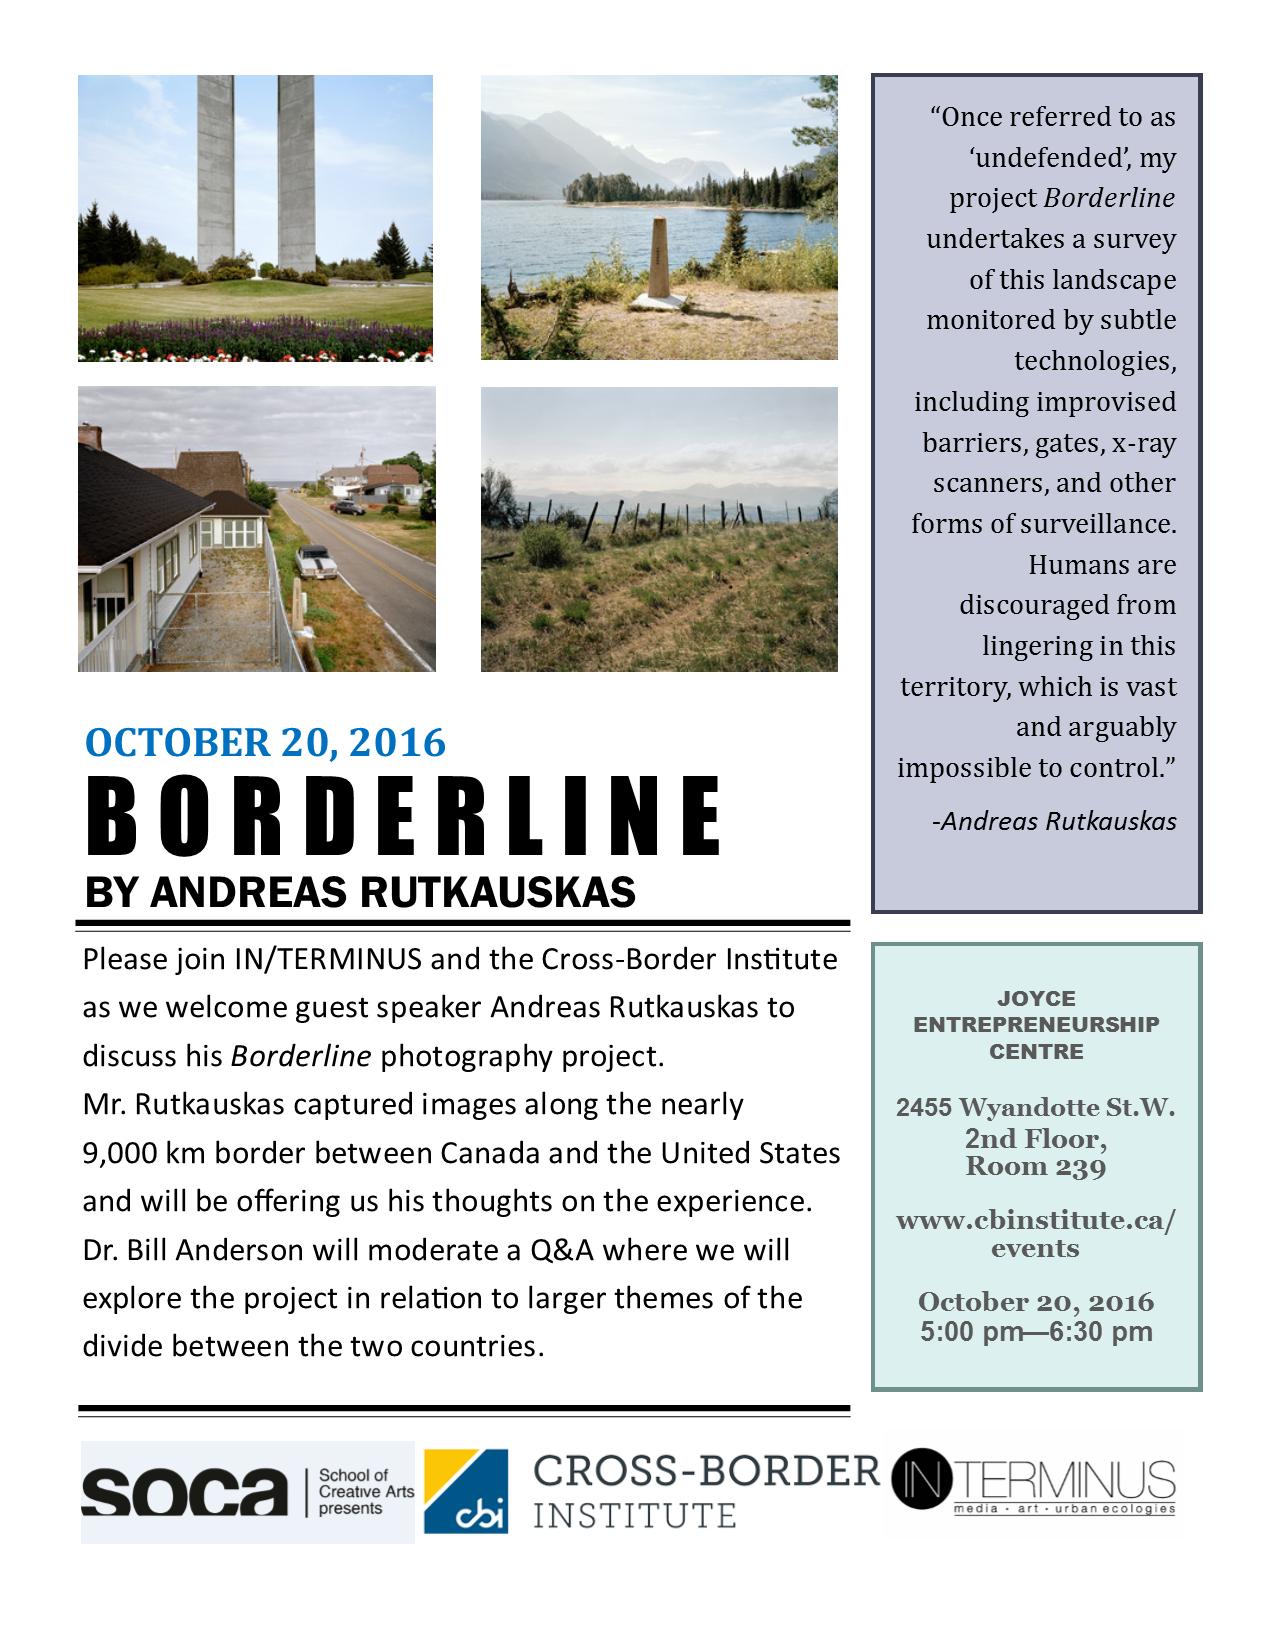 borderline-flyer-final